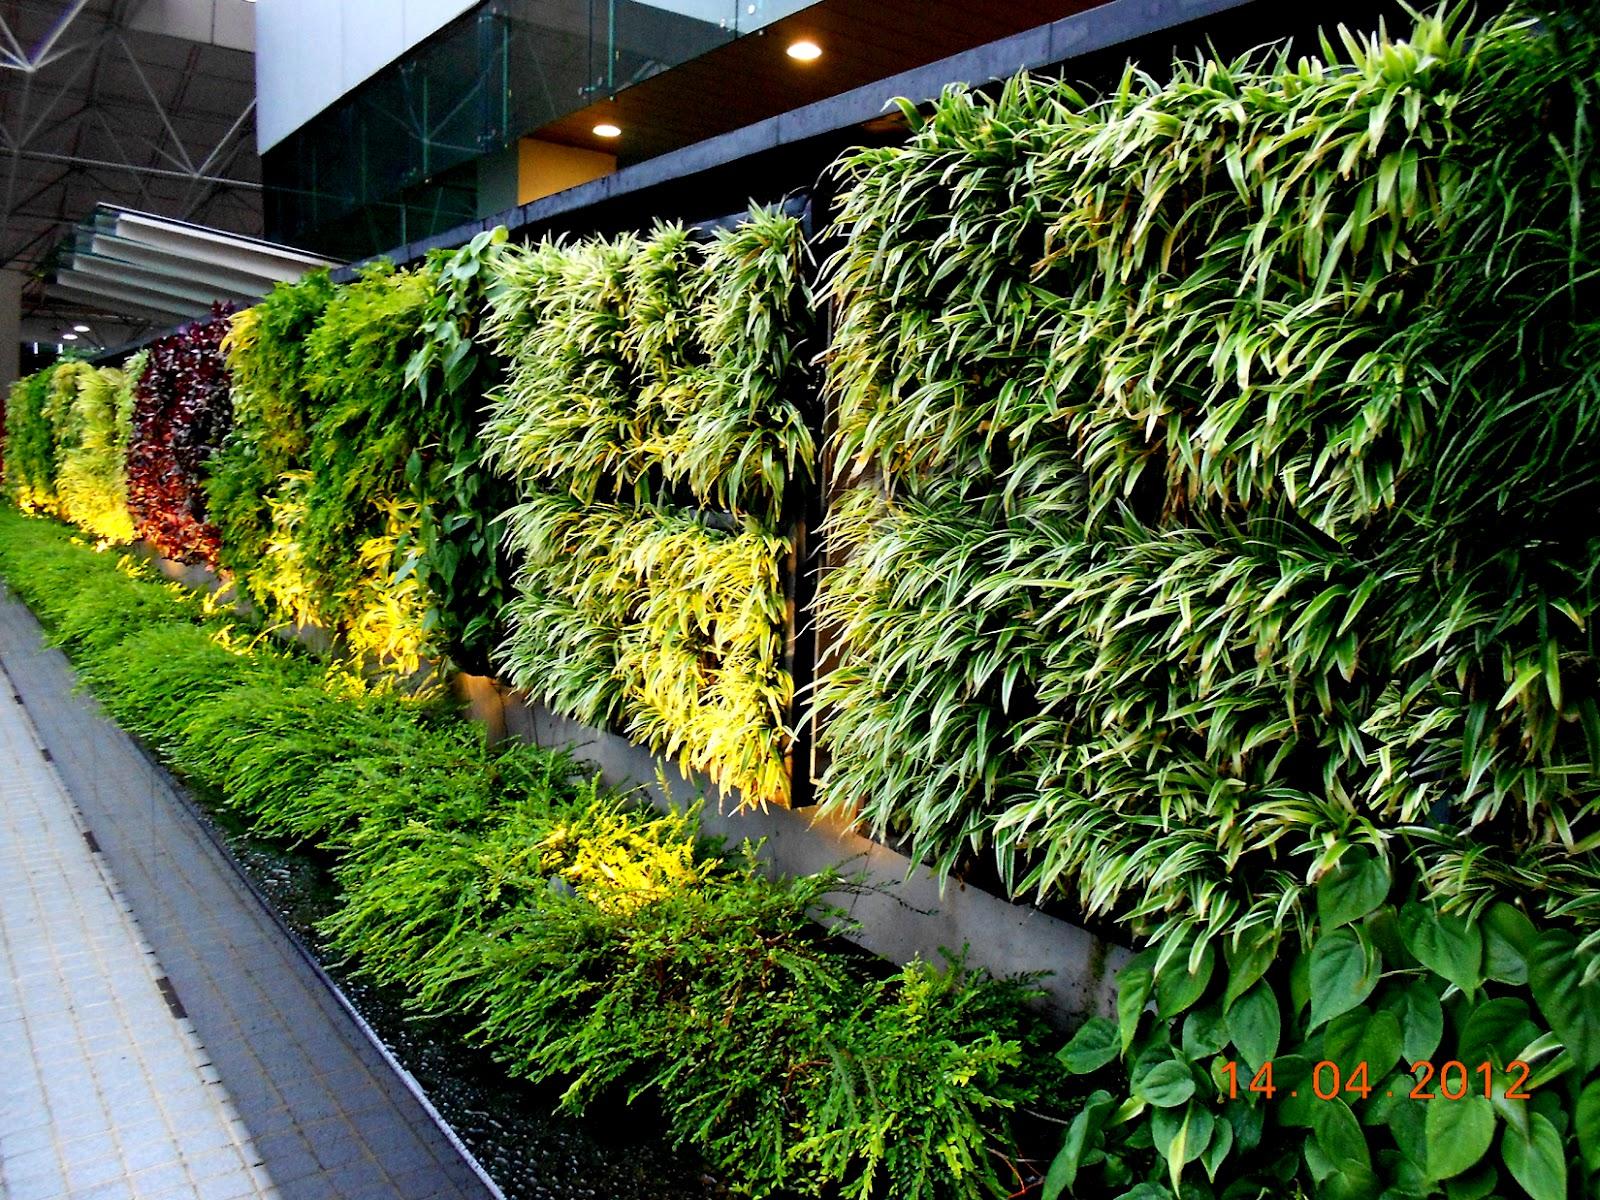 Vertical Garden Concept For Buildings: Greenwall Vertical